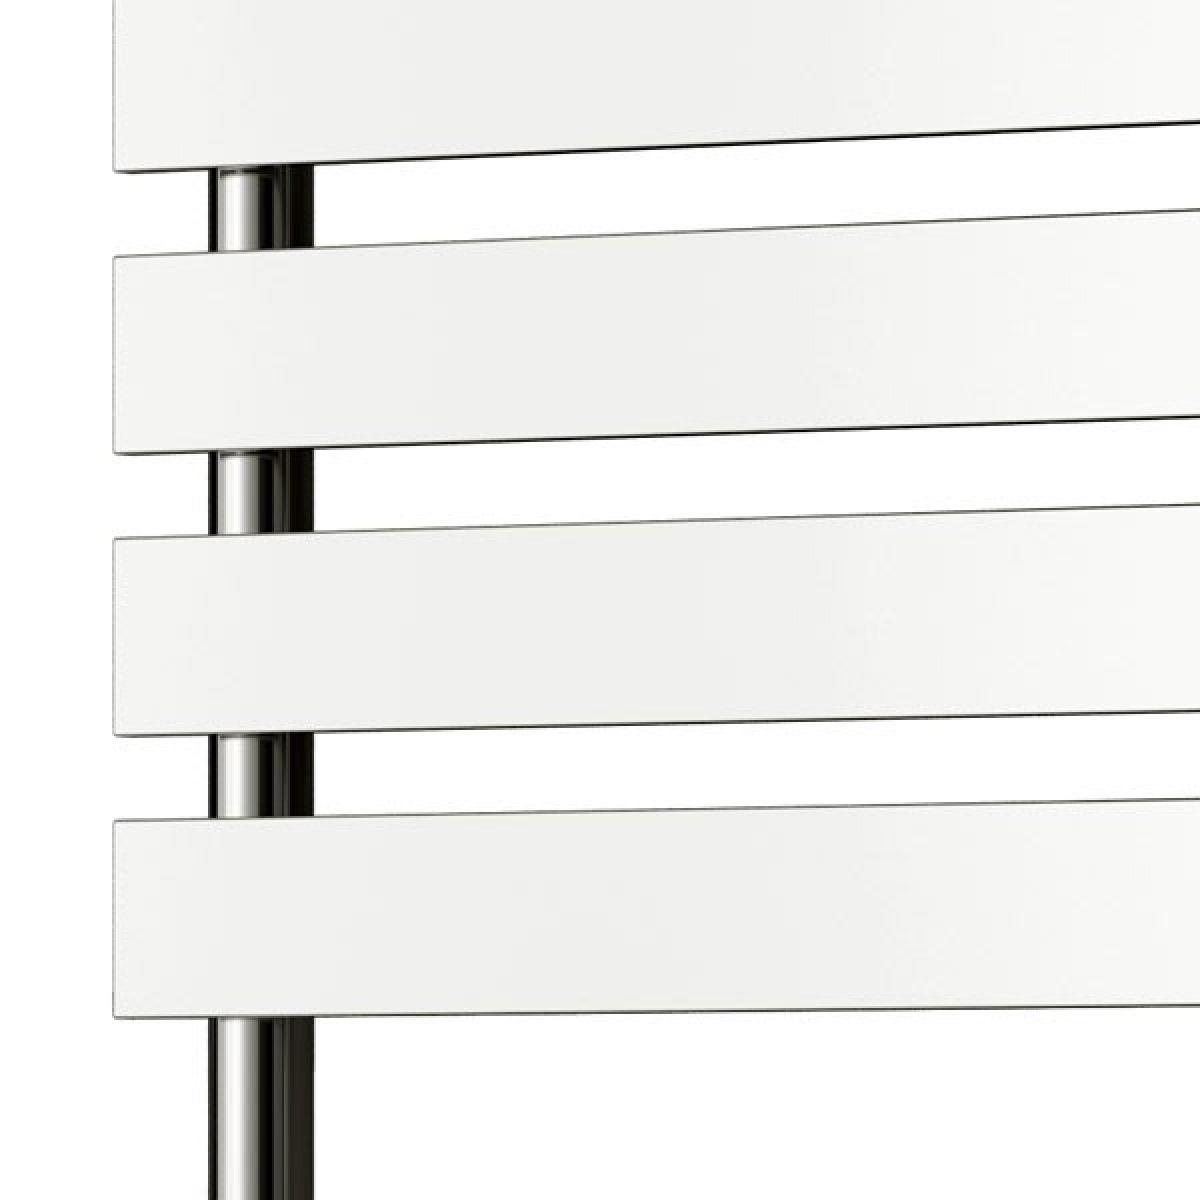 Trento Chrome Electric Towel Rail 1300mm x 500mm Detail 1